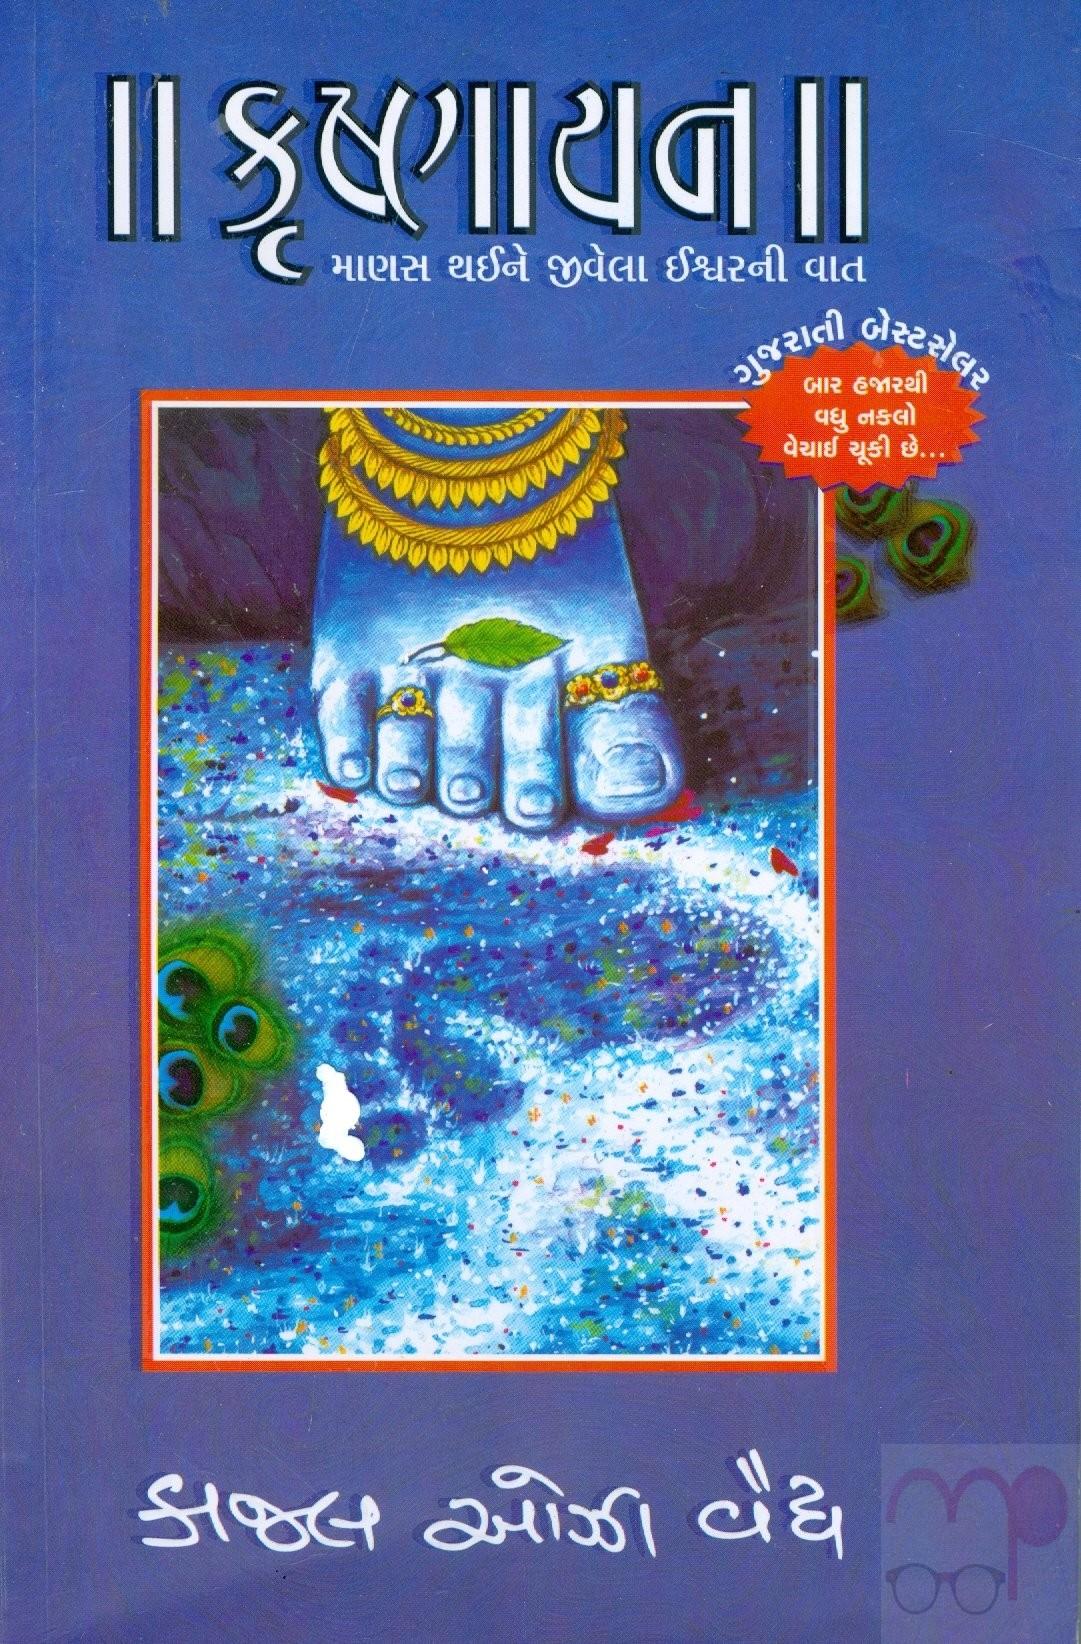 Krishnayan - Gujarati Books